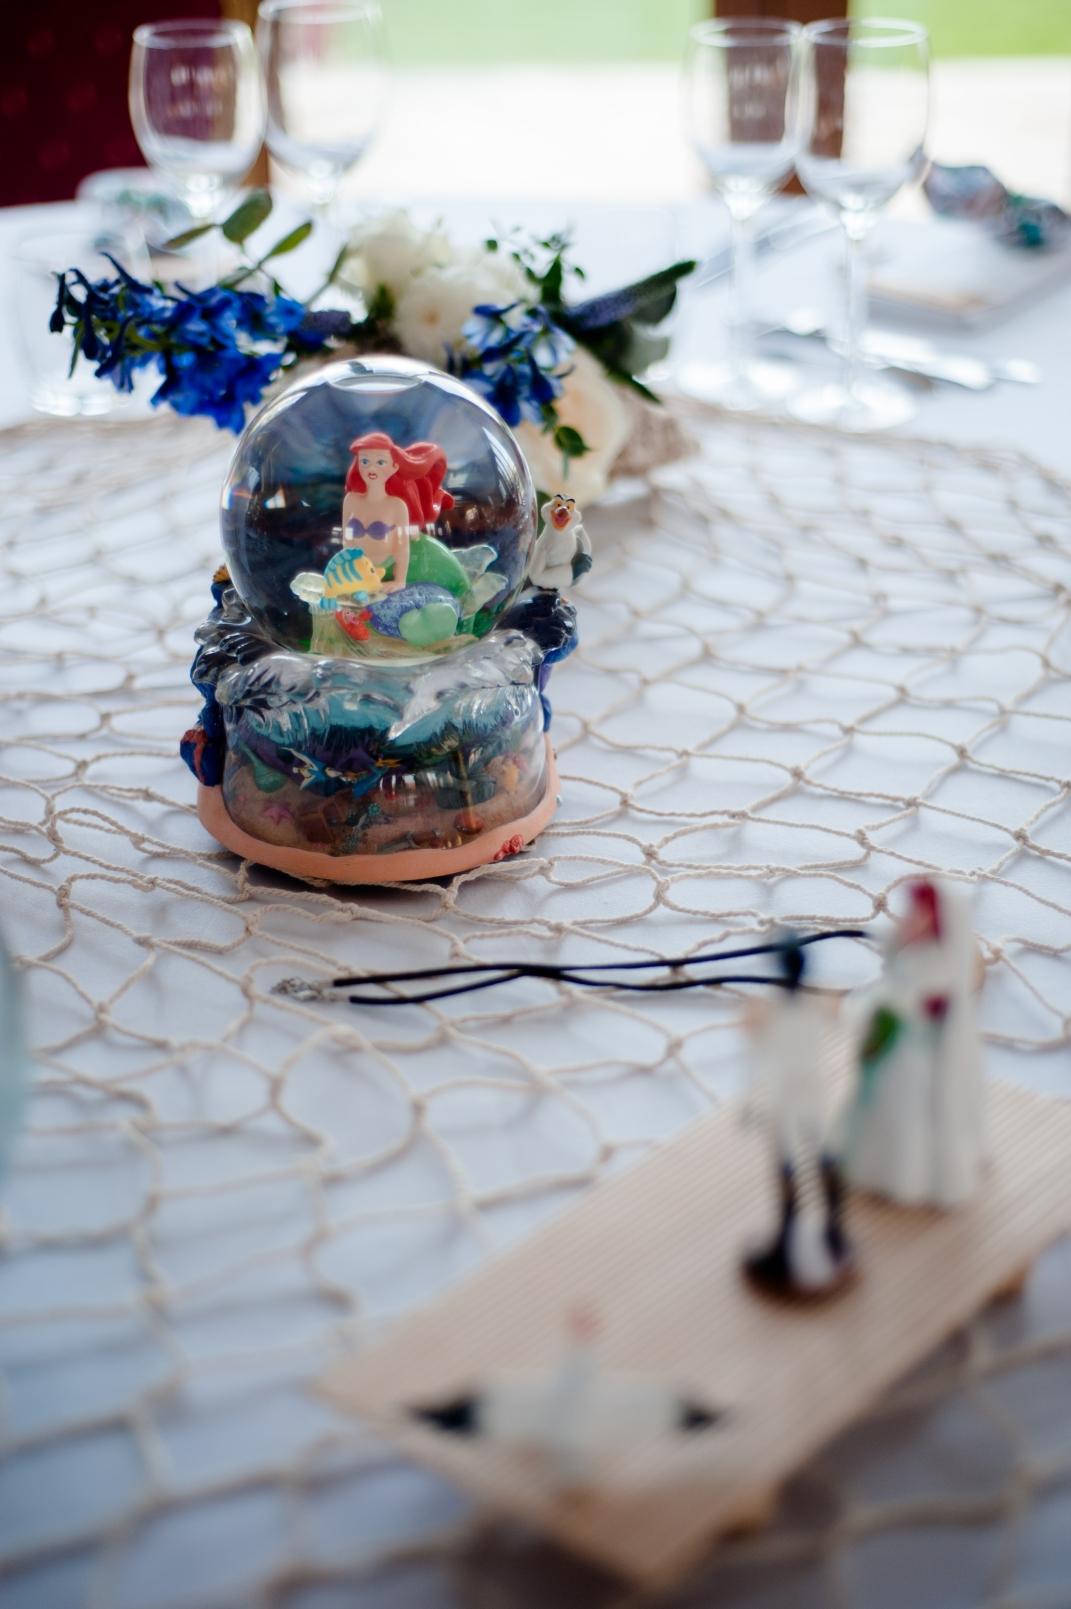 Mariage Disney, table La petite sirène